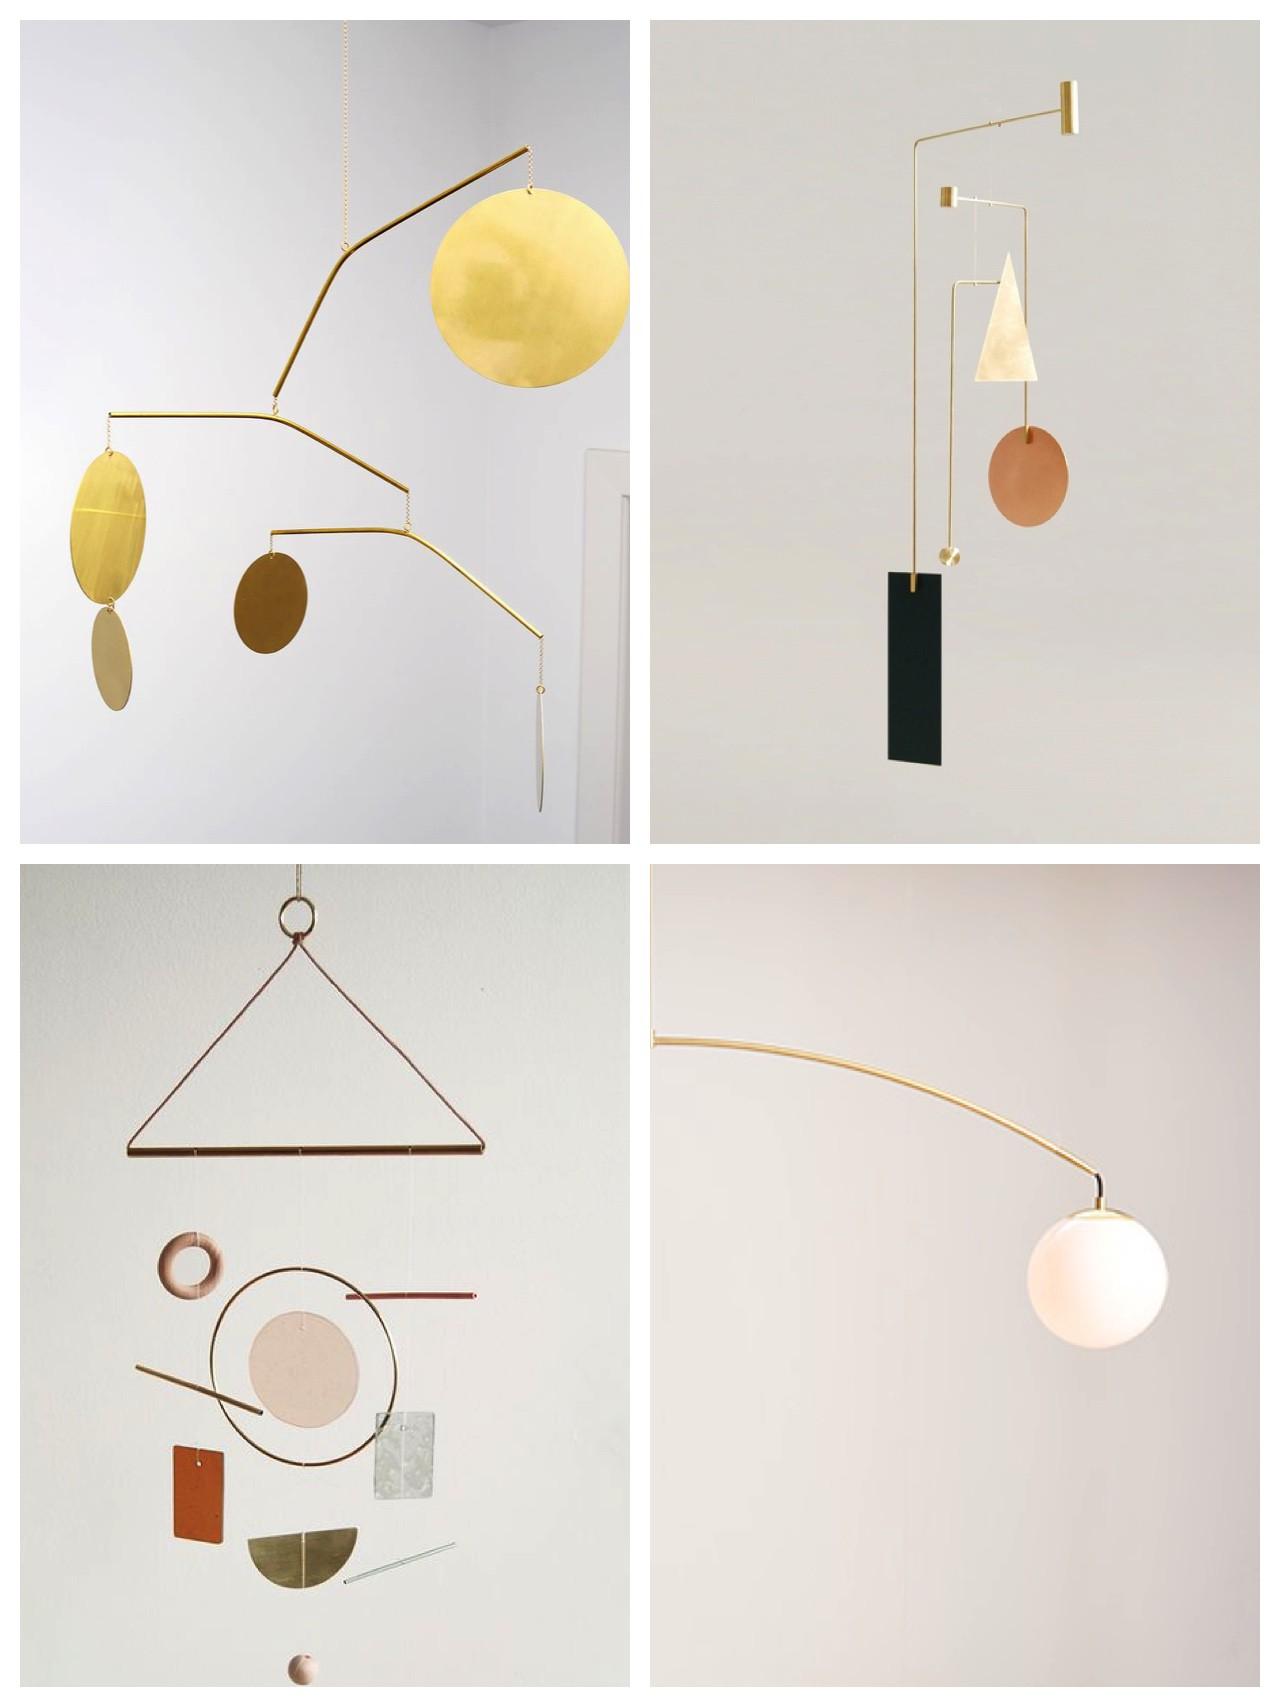 kooye blogzine kunst mode design musik wohnen. Black Bedroom Furniture Sets. Home Design Ideas